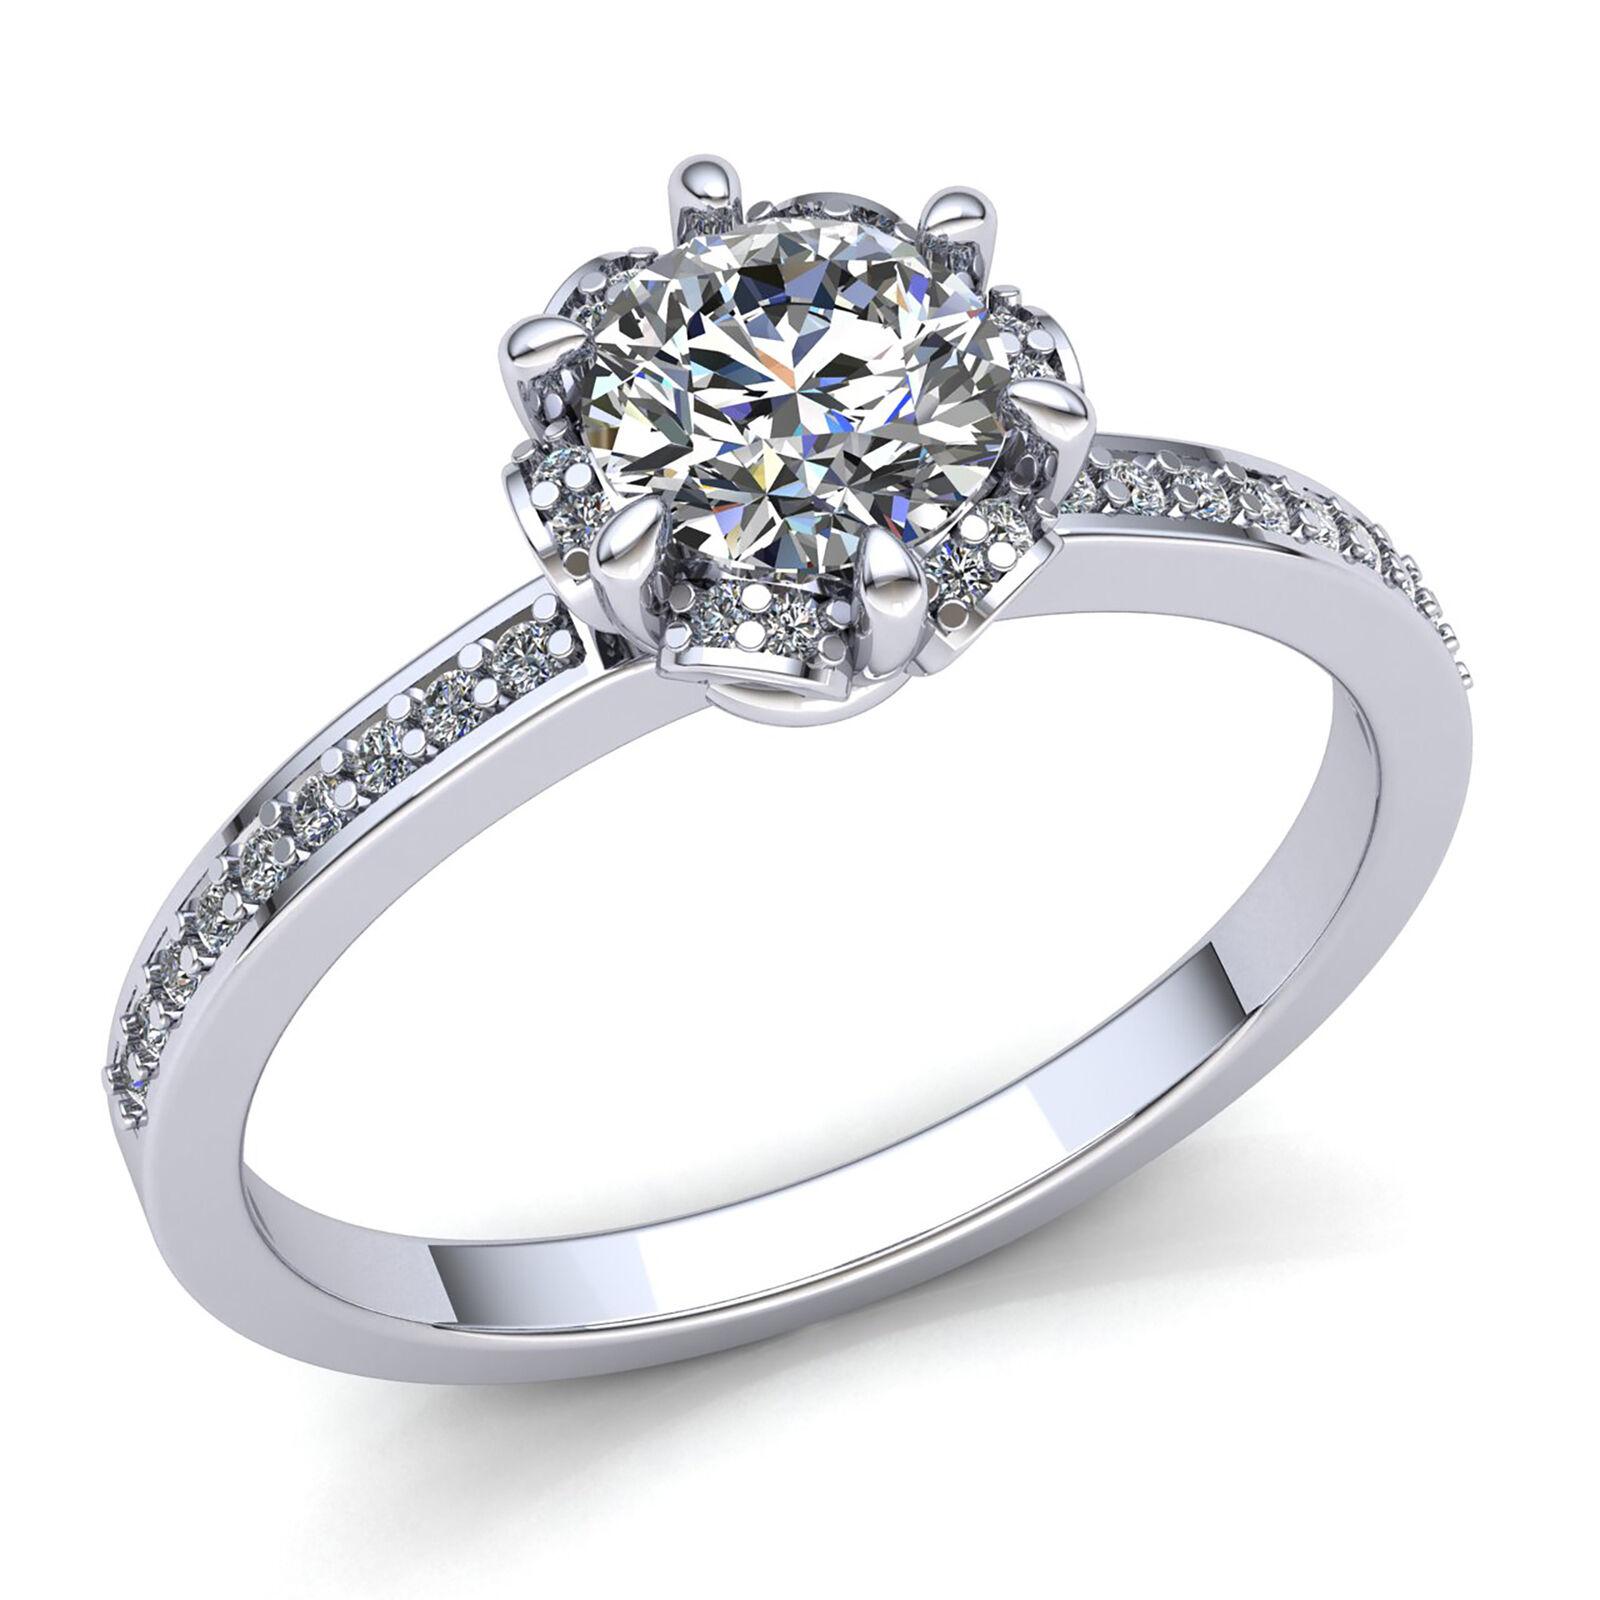 1ct Round Cut Diamond Ladies Bridal Accent Solitaire Engagement Ring 14K gold